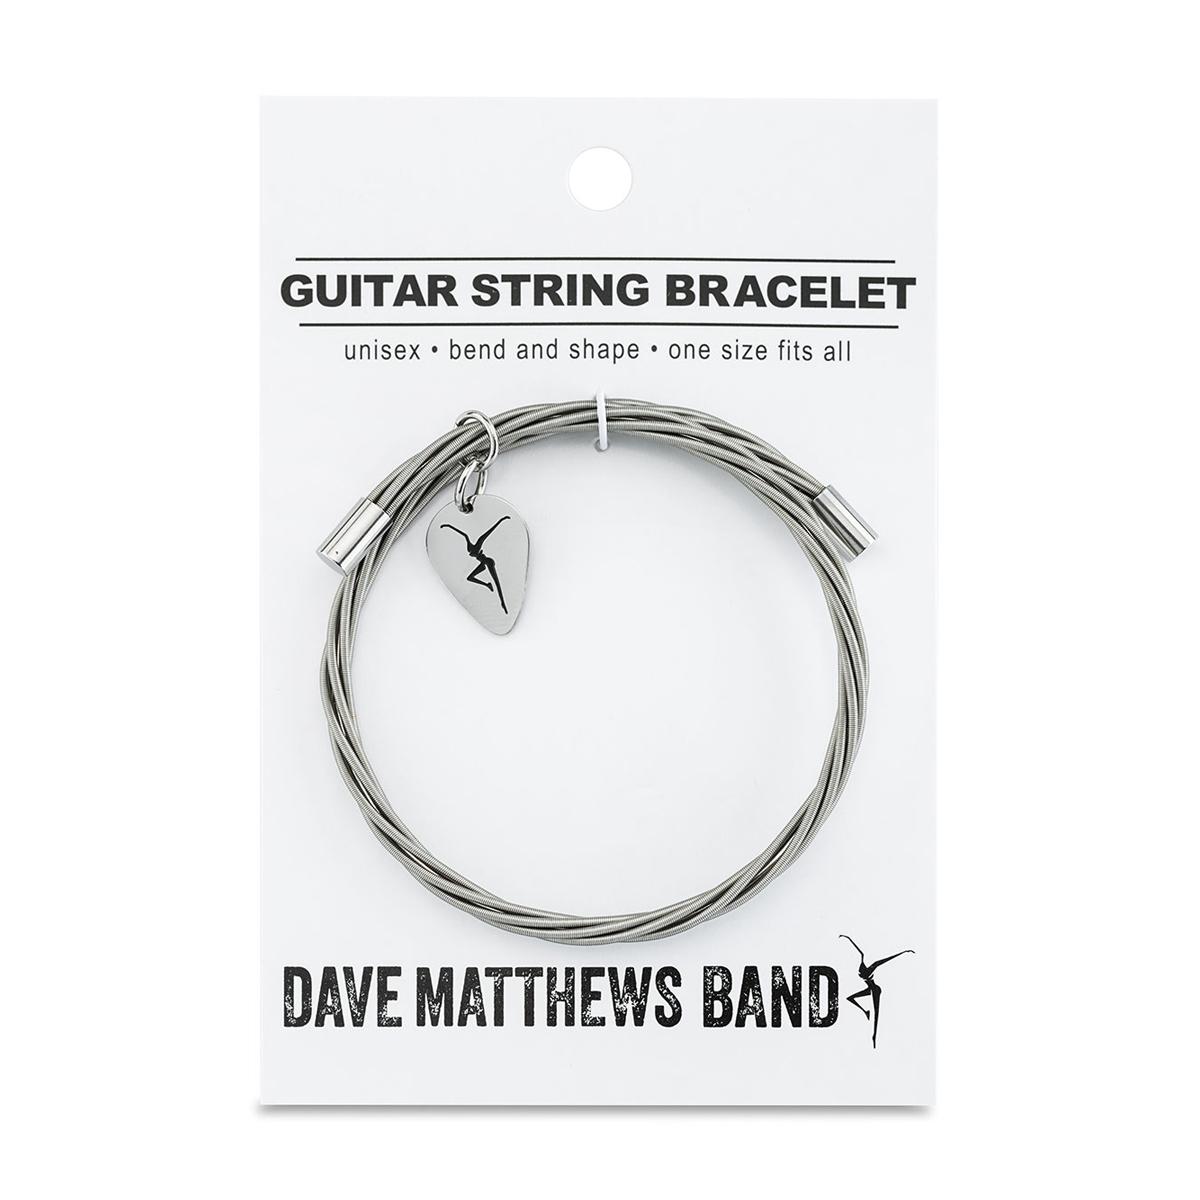 DMB - Guitar String Bracelet